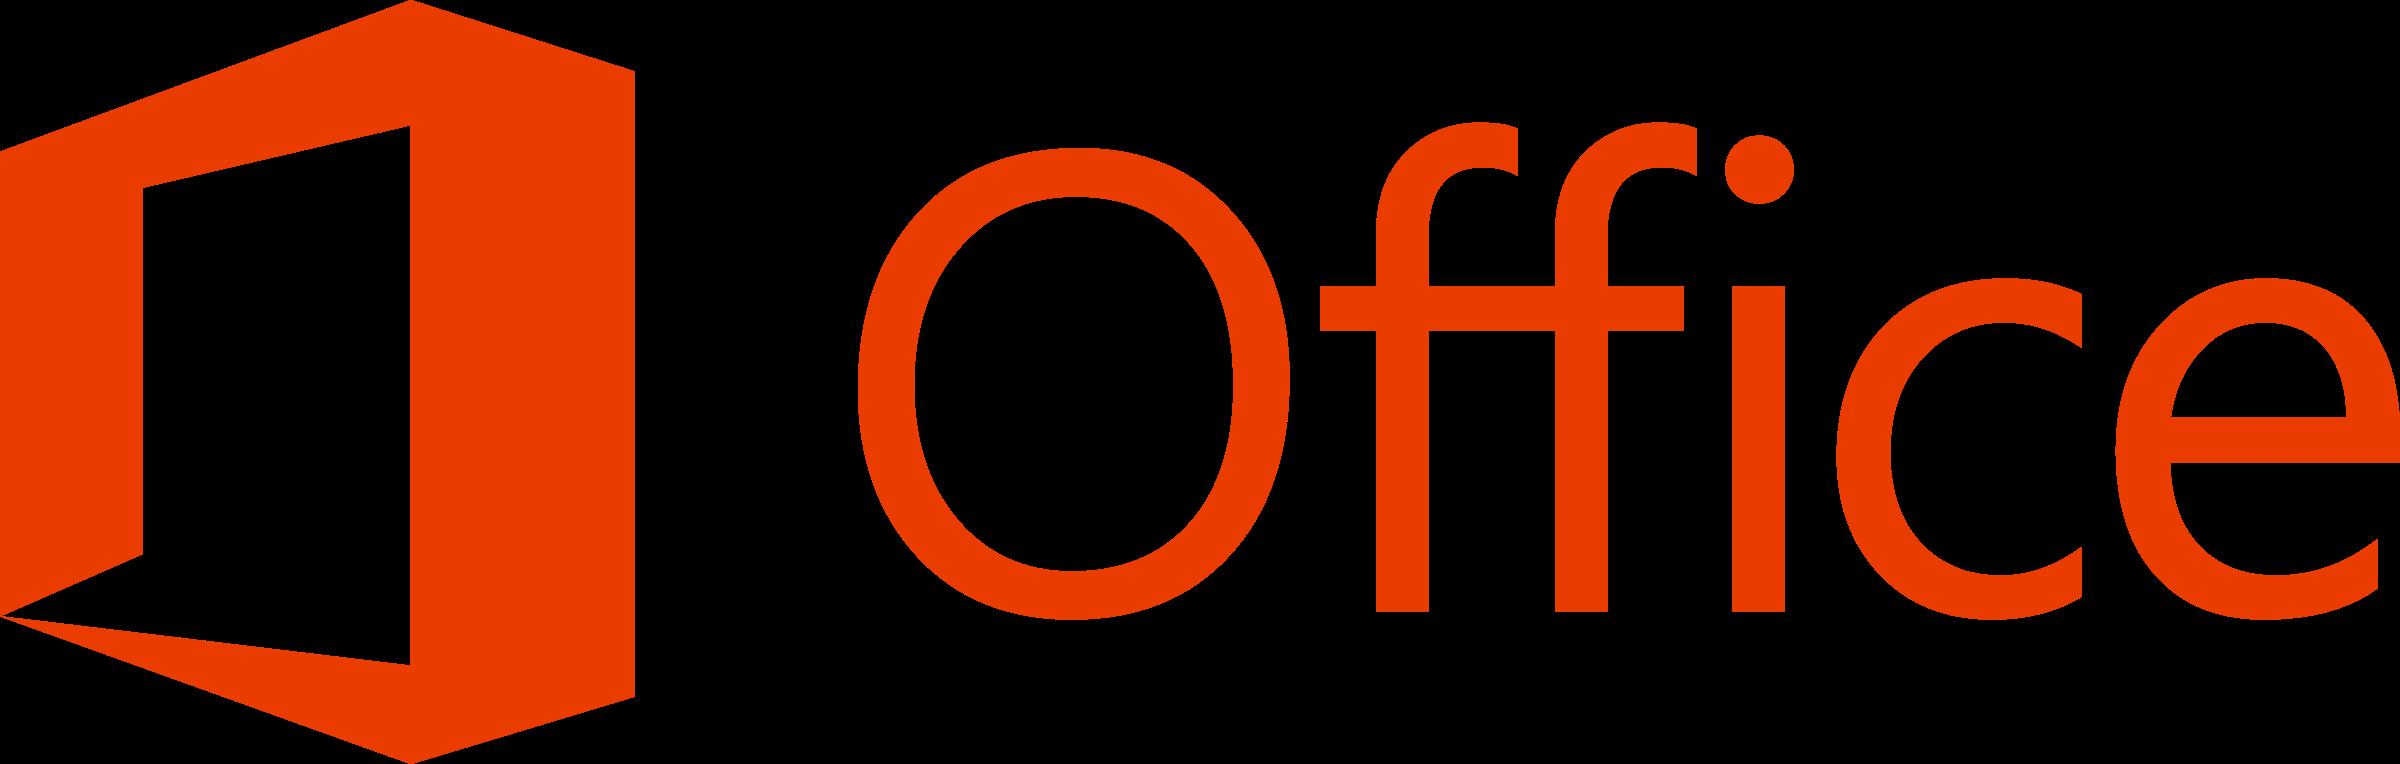 Microsoft Office 2013 Logo PNG Transparent & SVG Vector.